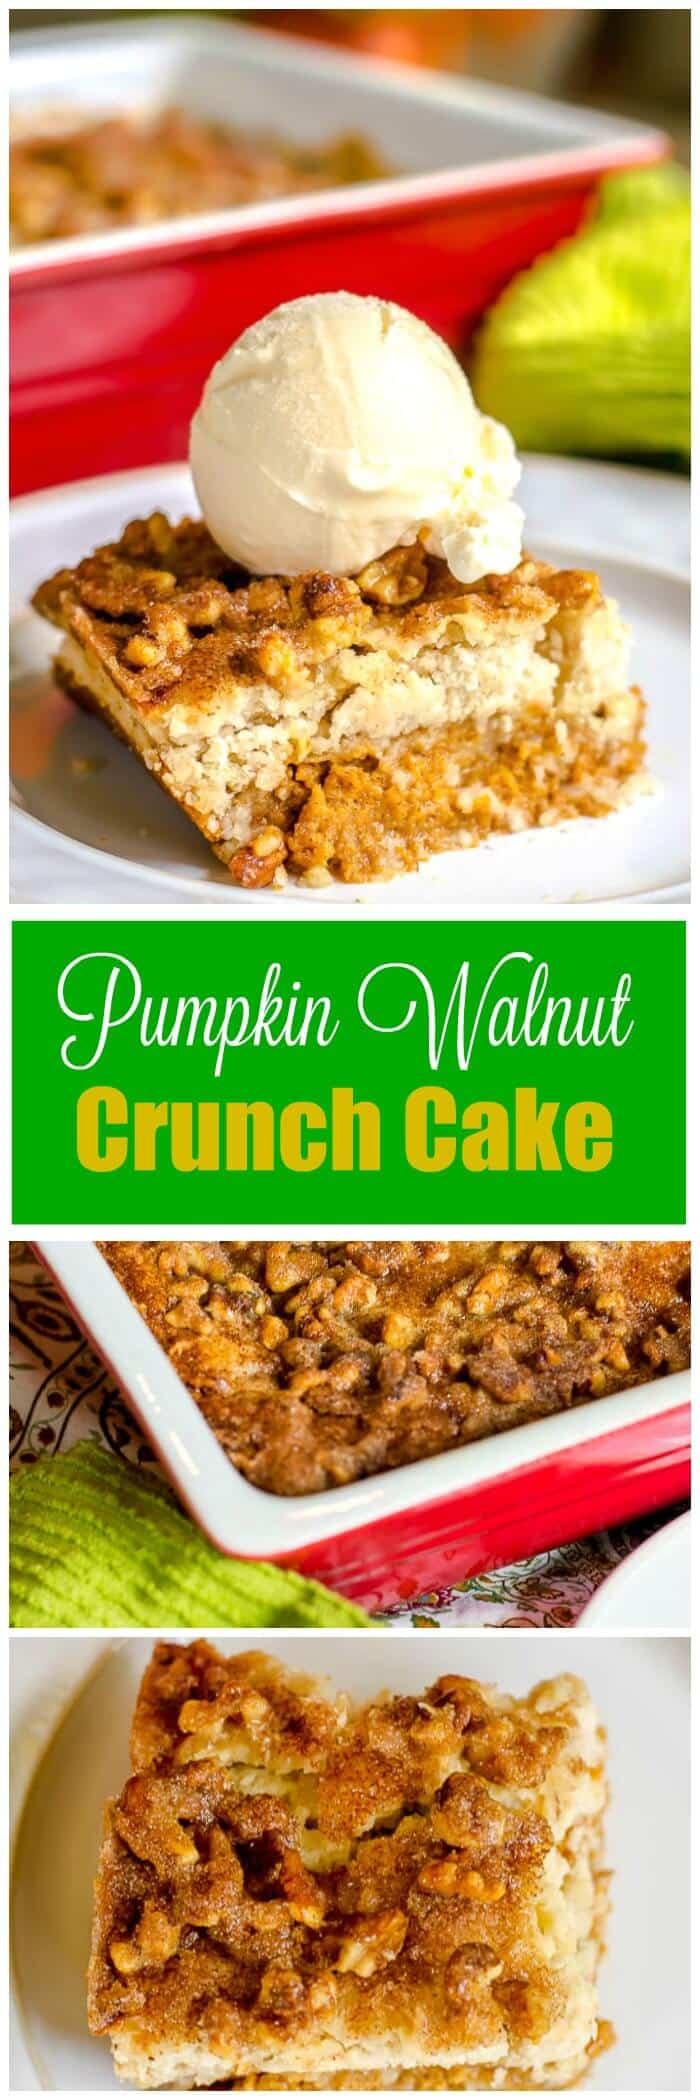 Pumpkin Walnut Crunch Cake Pumpkin Crunch Cake